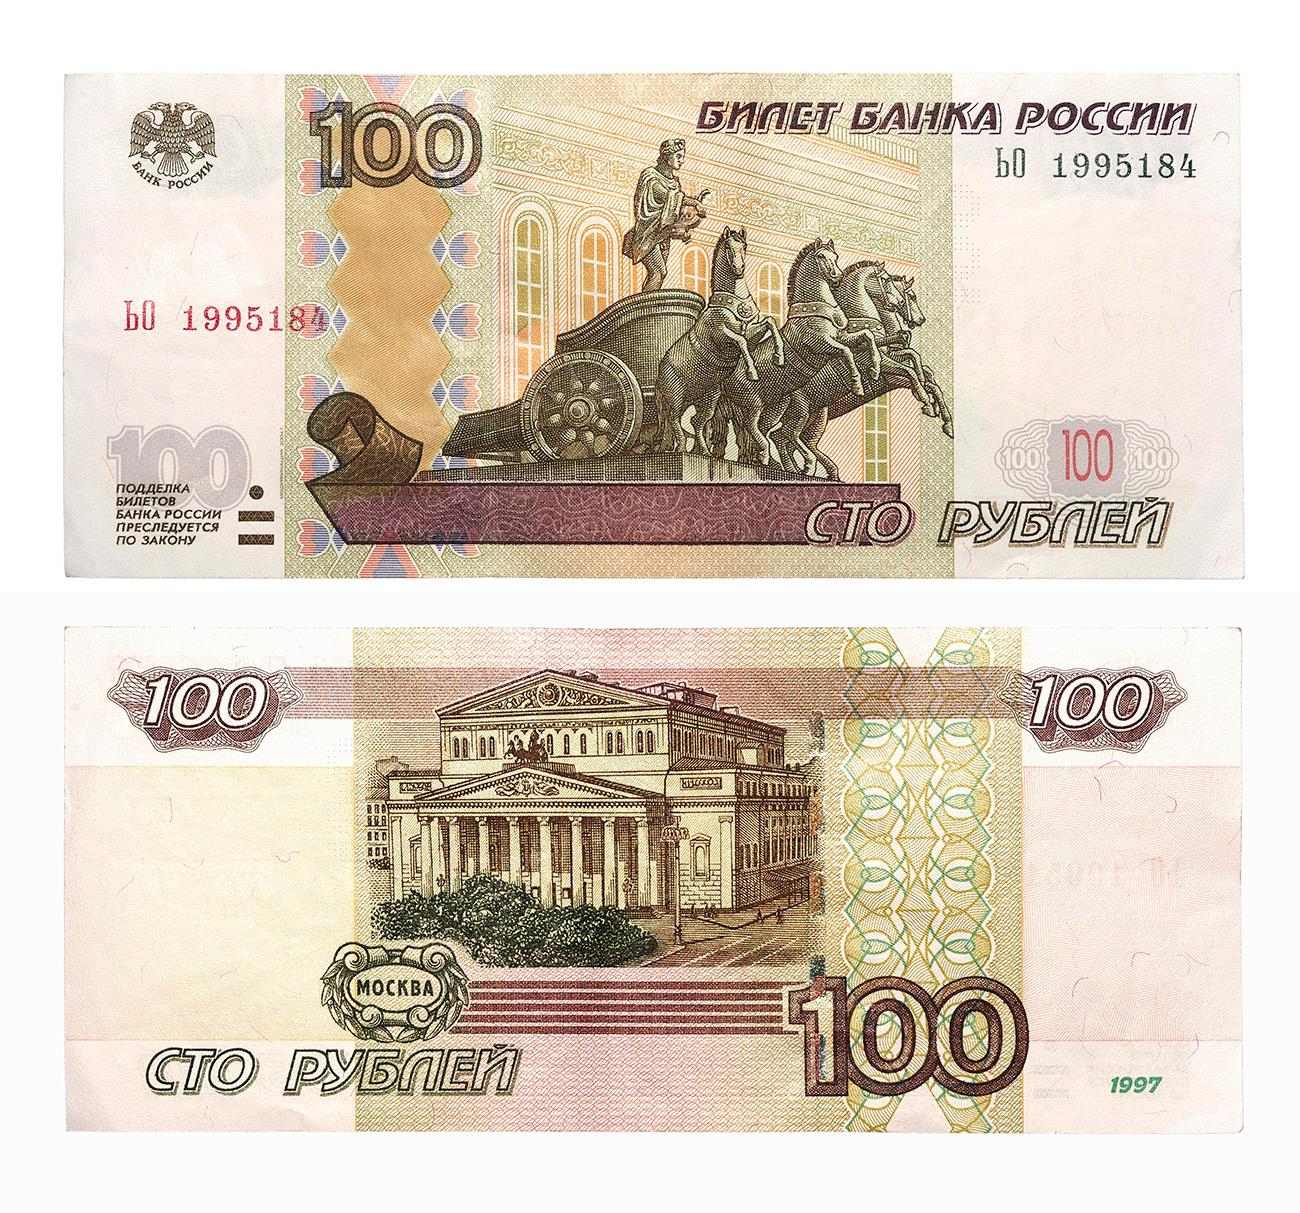 100 rubles / Global Look Press